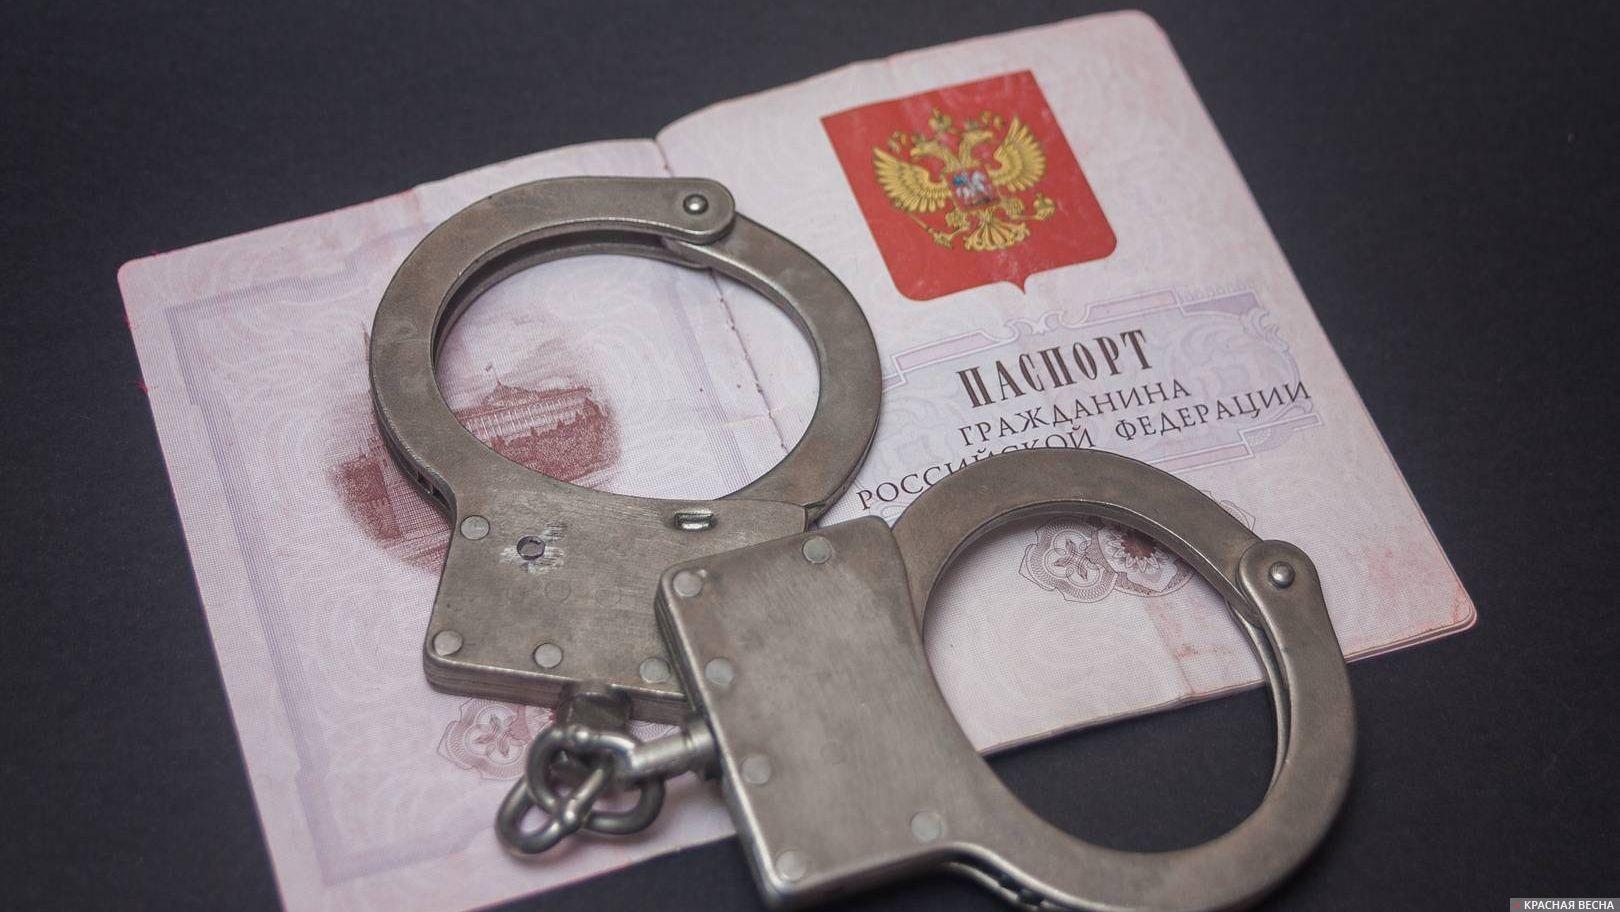 Наручники браслеты арест задержание паспорт